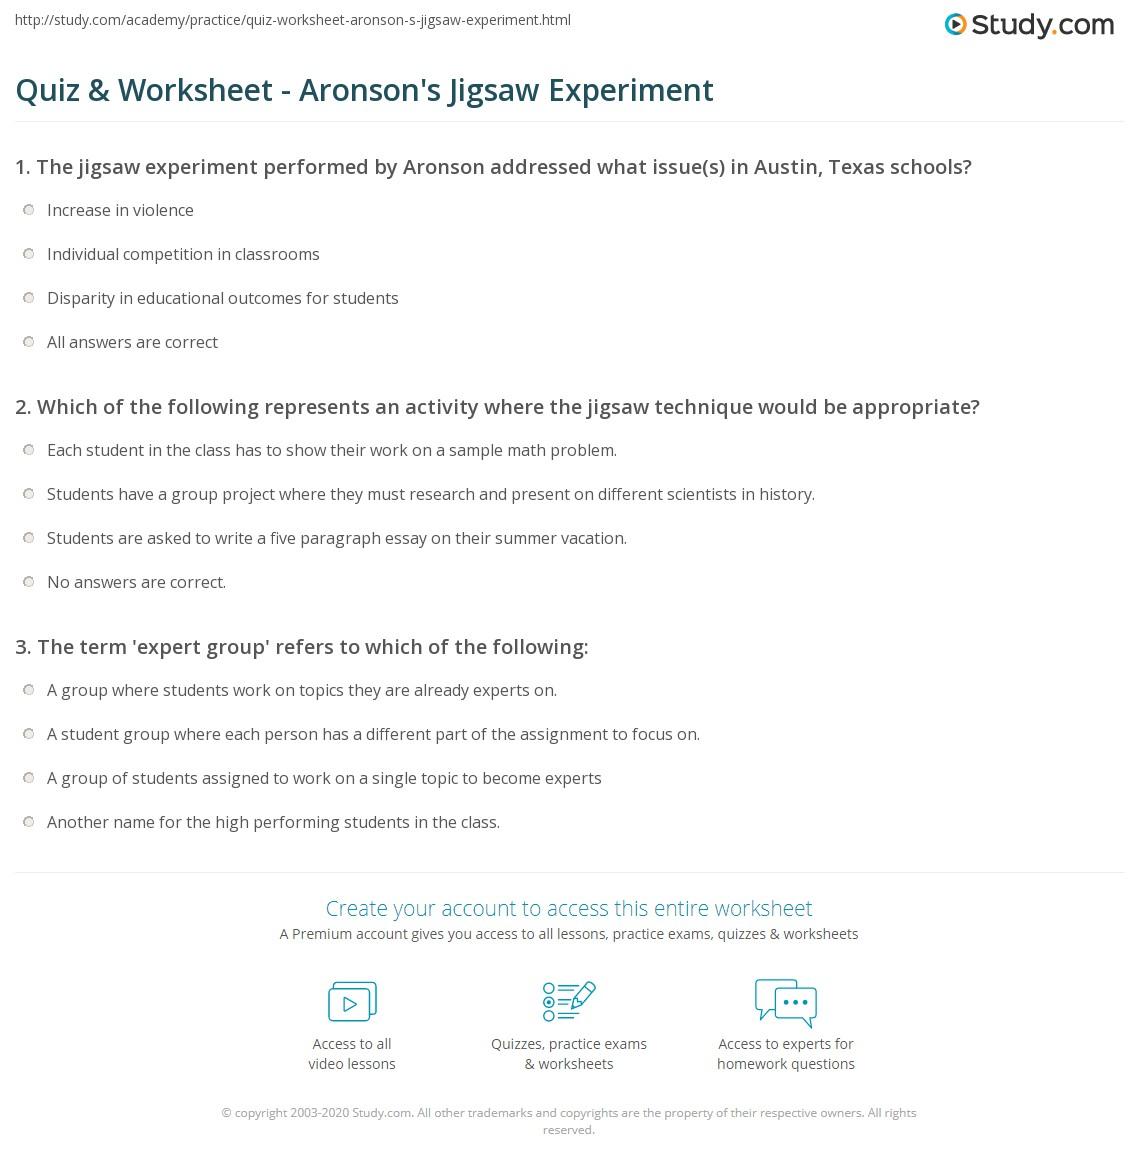 Quiz & Worksheet - Aronson's Jigsaw Experiment | Study.com